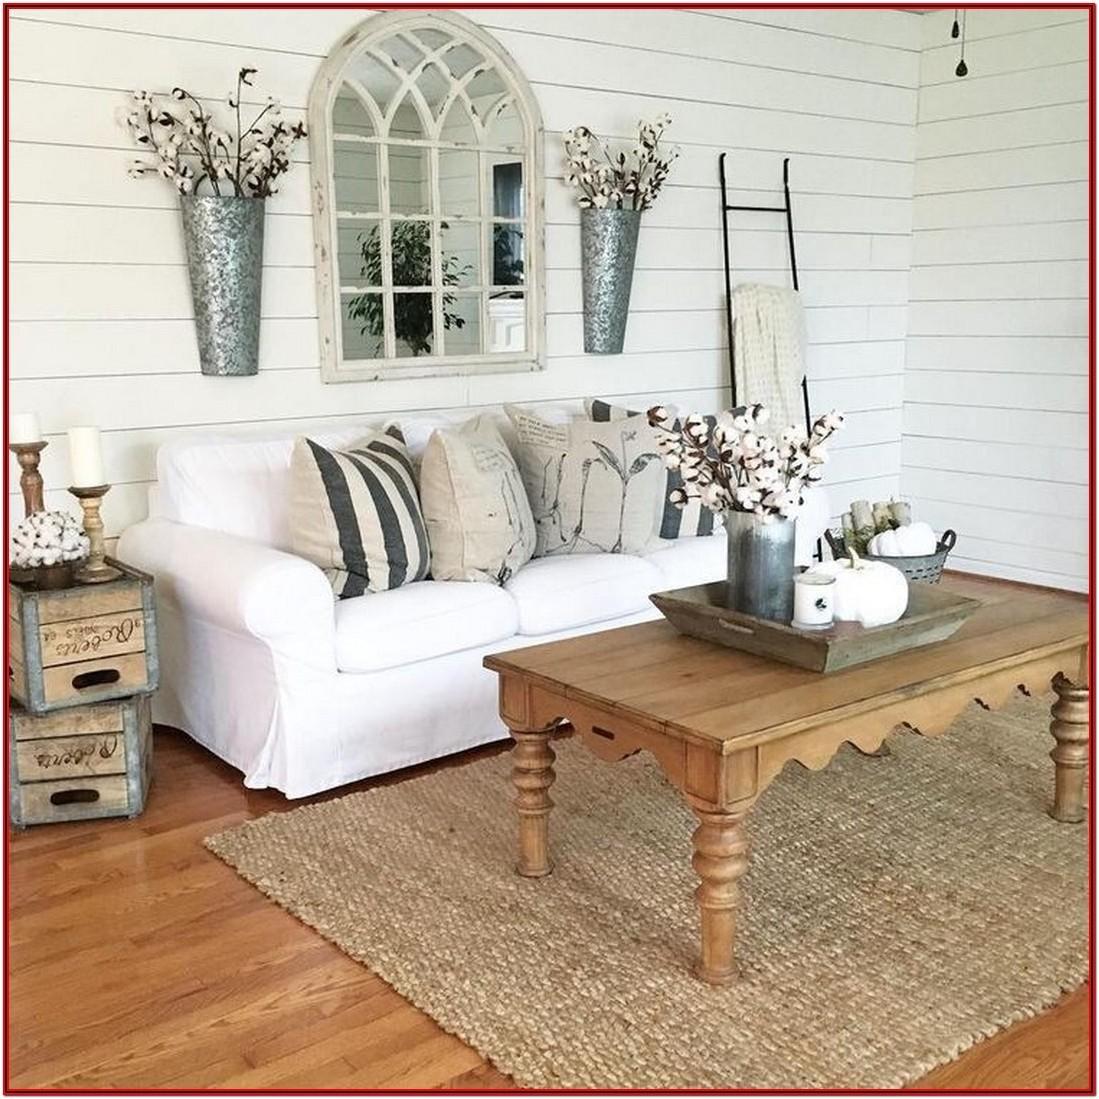 Home Decor Ideas For Living Room Walls